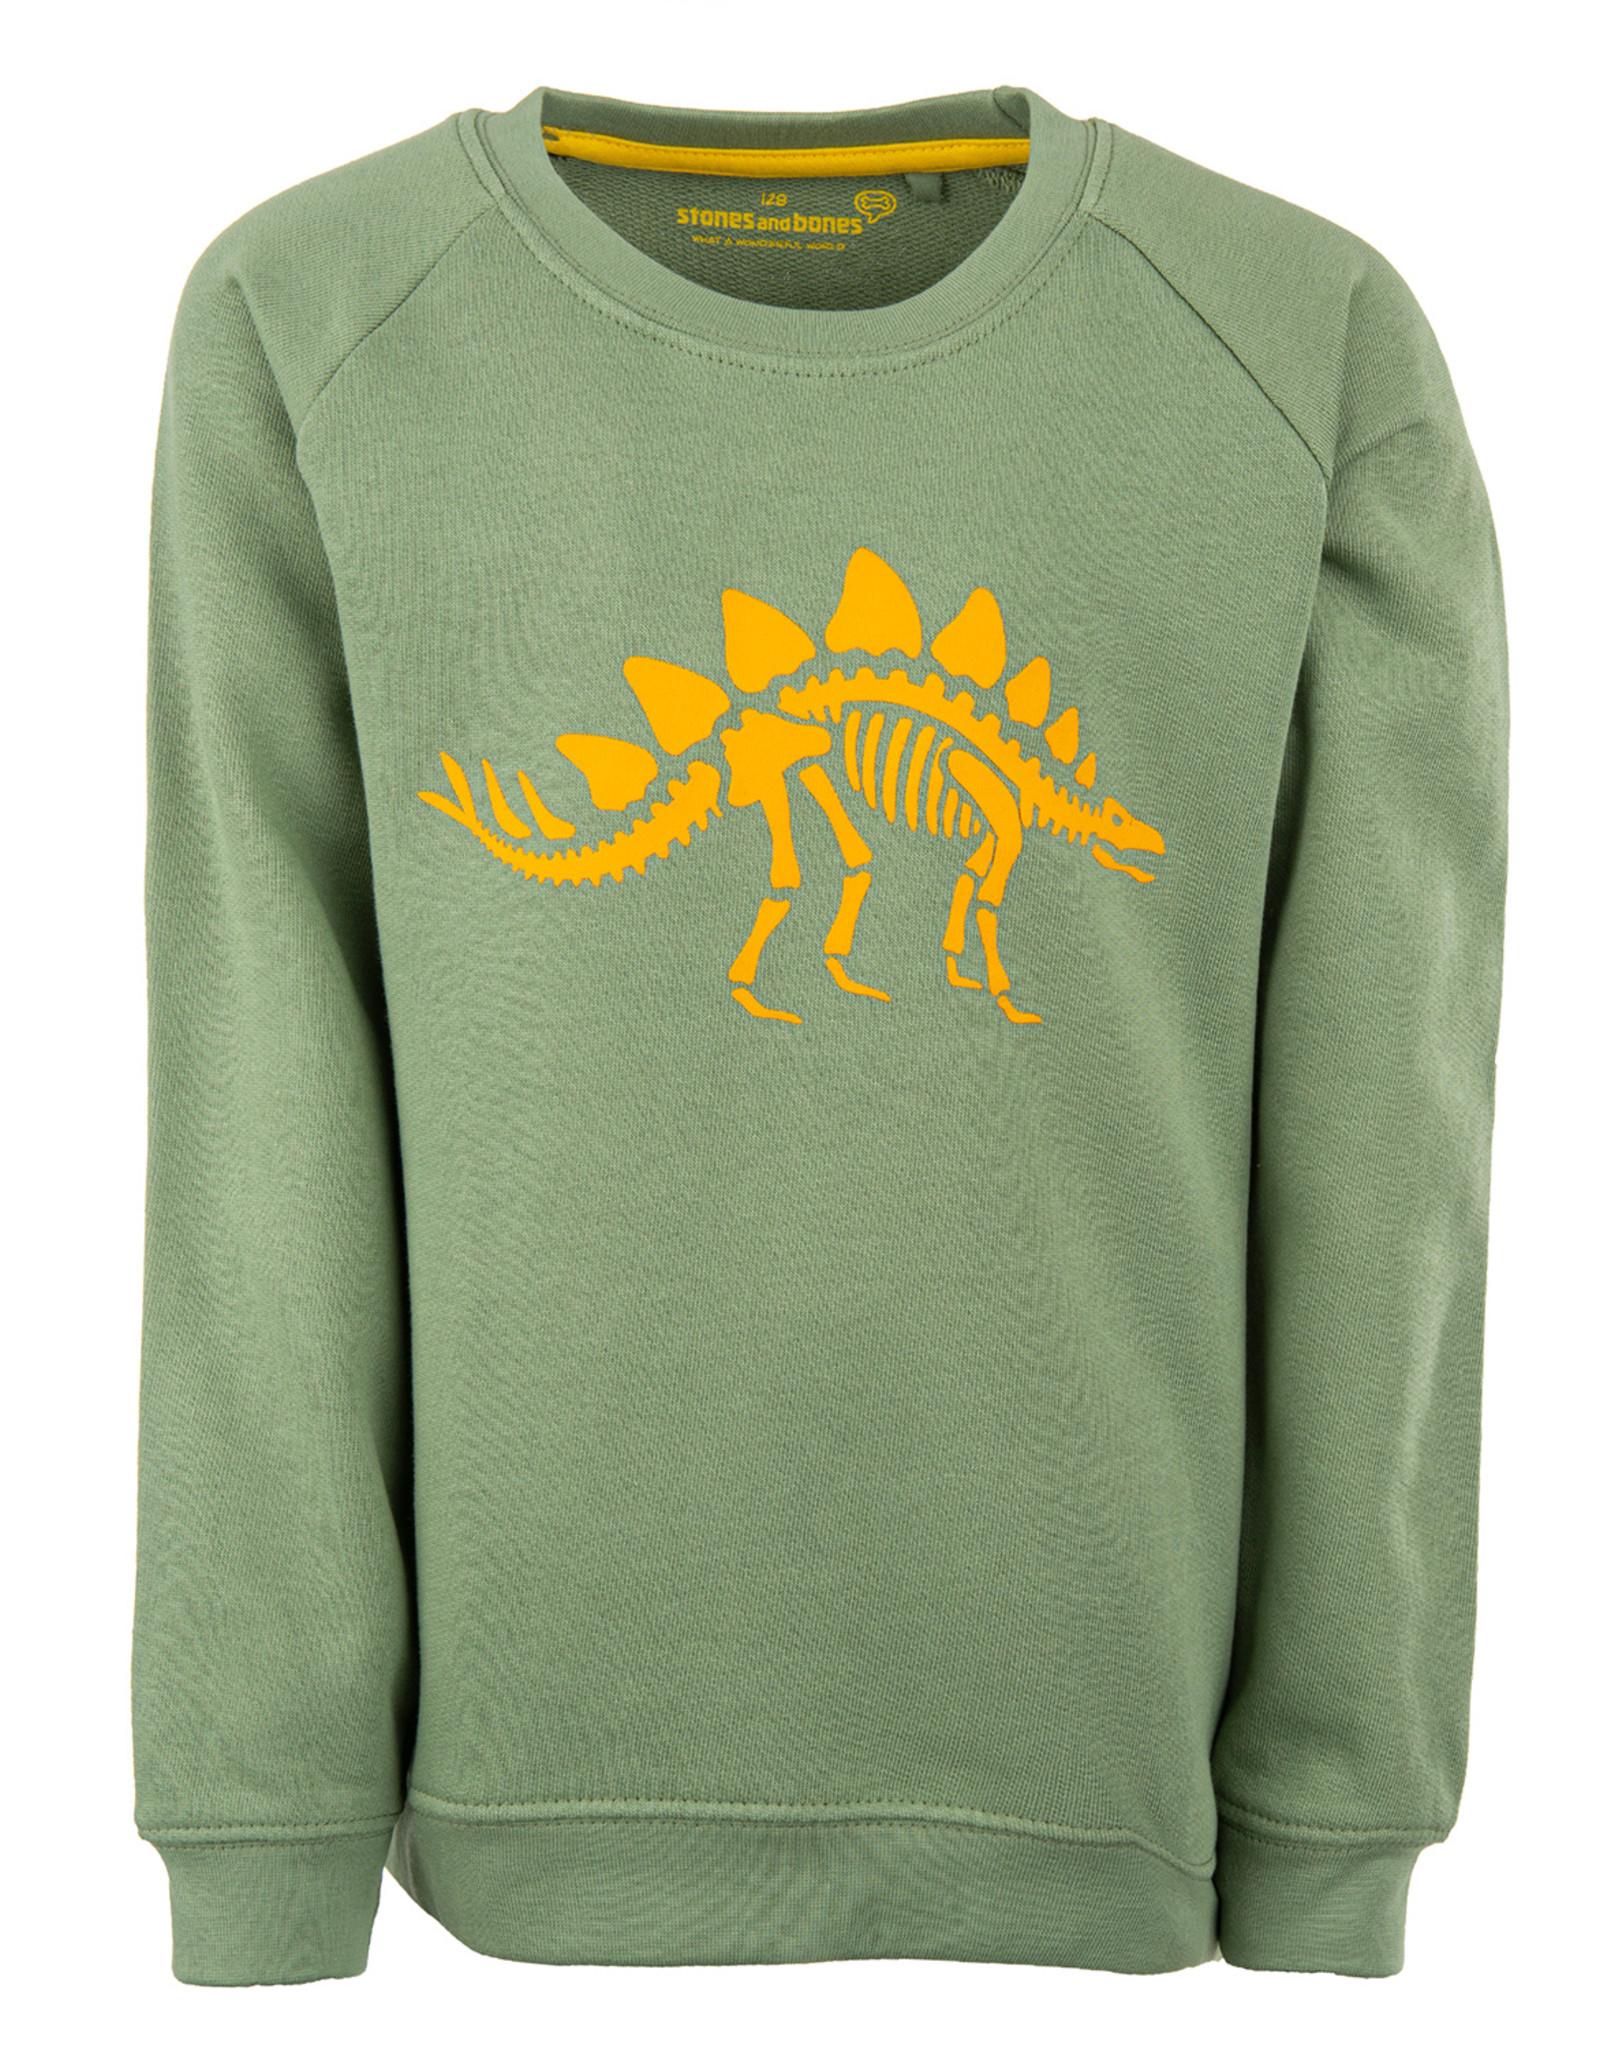 Stones and Bones Stones and Bones 'Imagine' Dino khaki sweatshirt